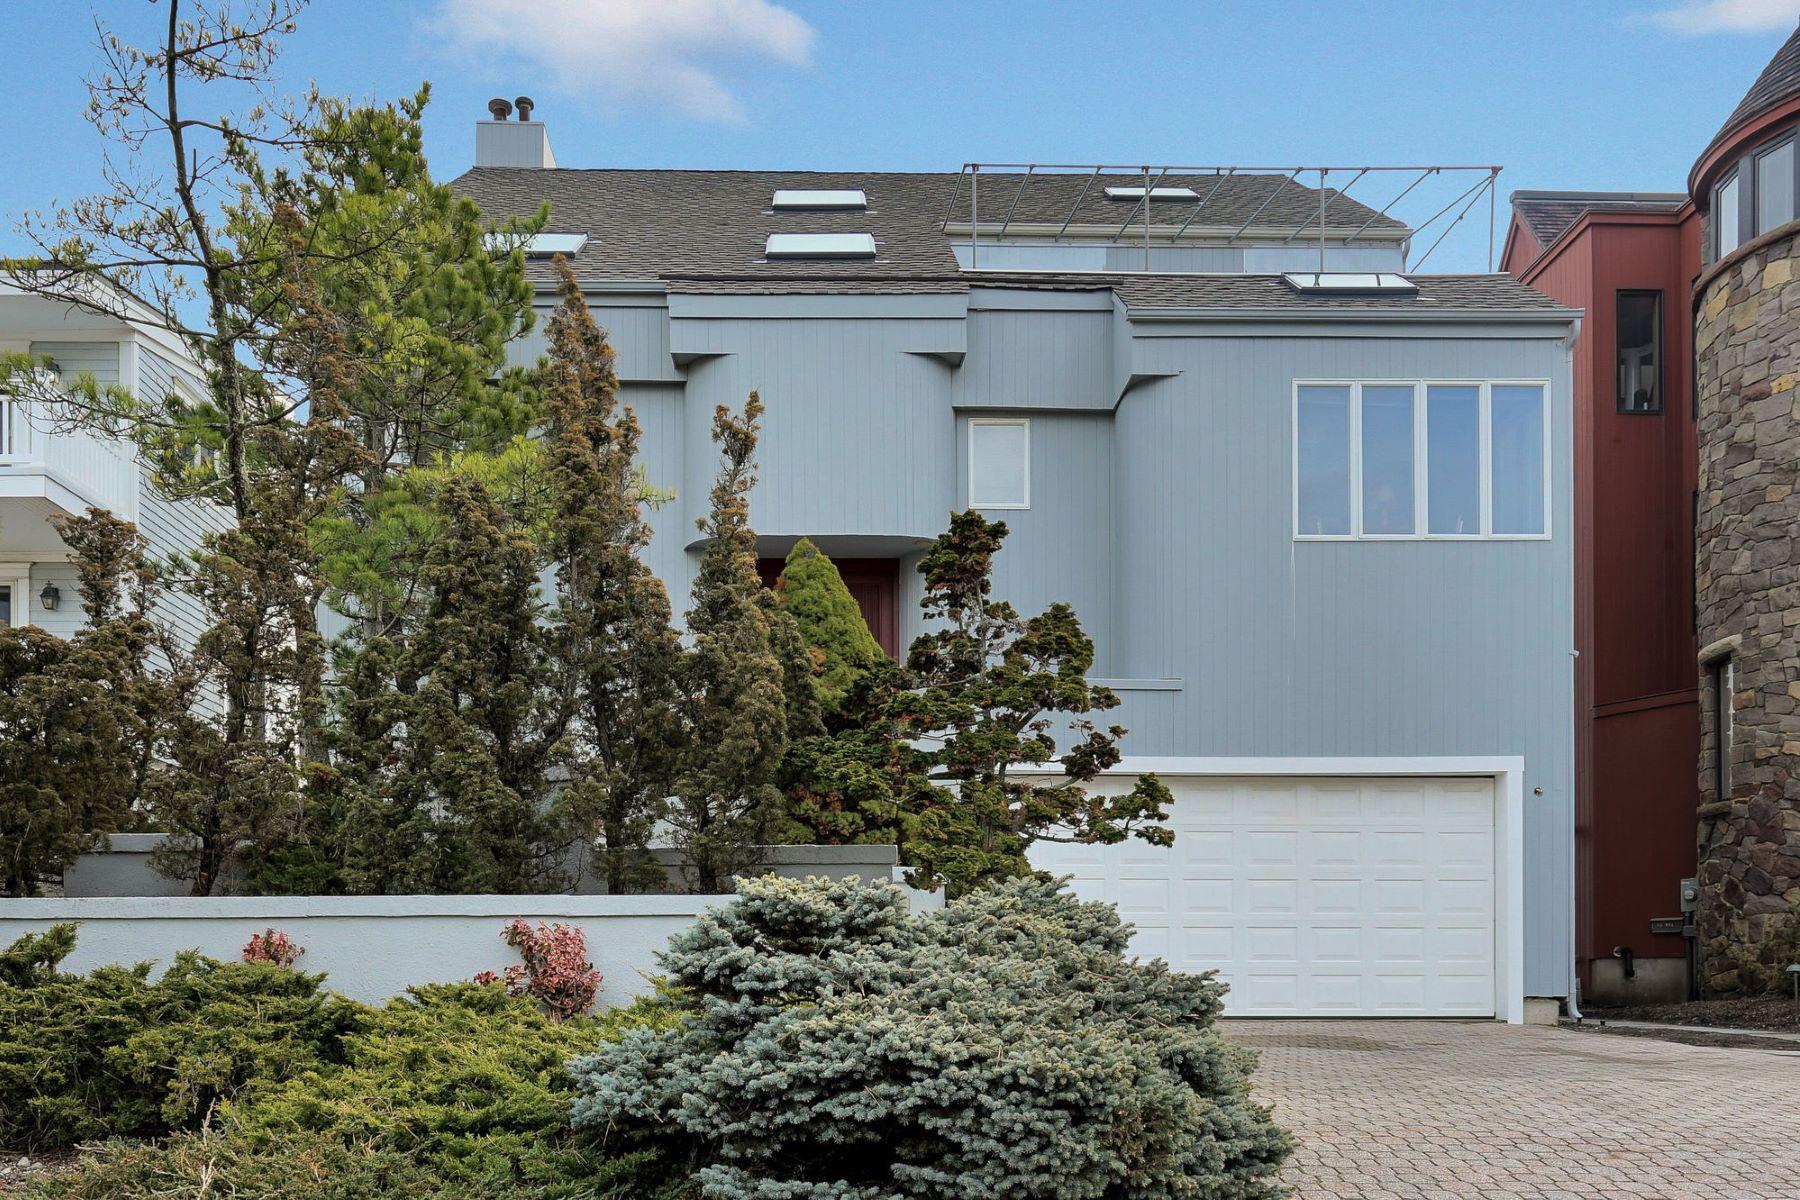 Single Family Homes для того Продажа на Sea Girt Beachfront 708 Morven Terrace, Sea Girt, Нью-Джерси 08750 Соединенные Штаты